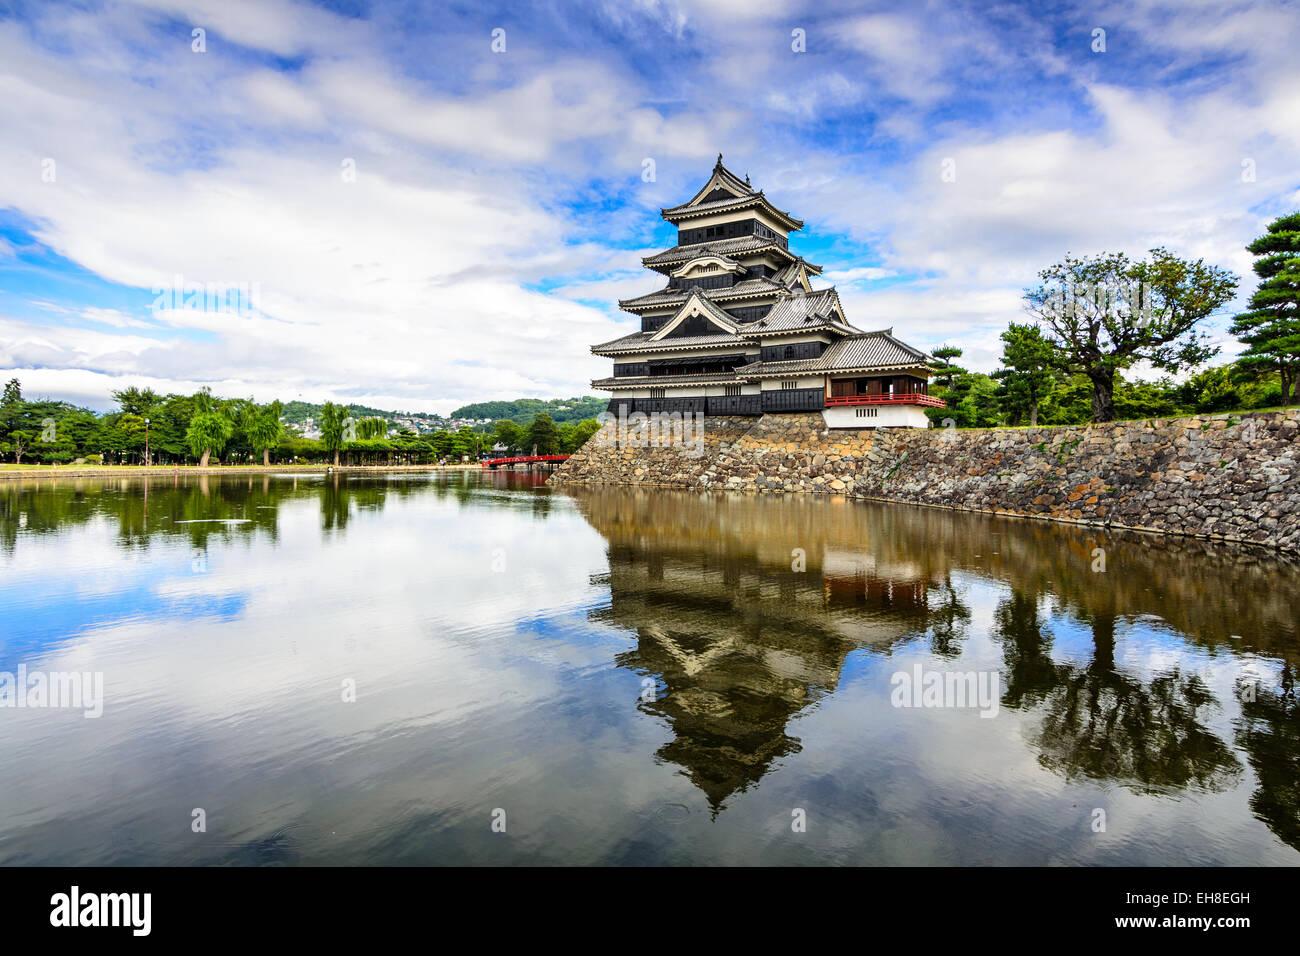 Mastumoto Castle in Matsumoto, Japan. - Stock Image